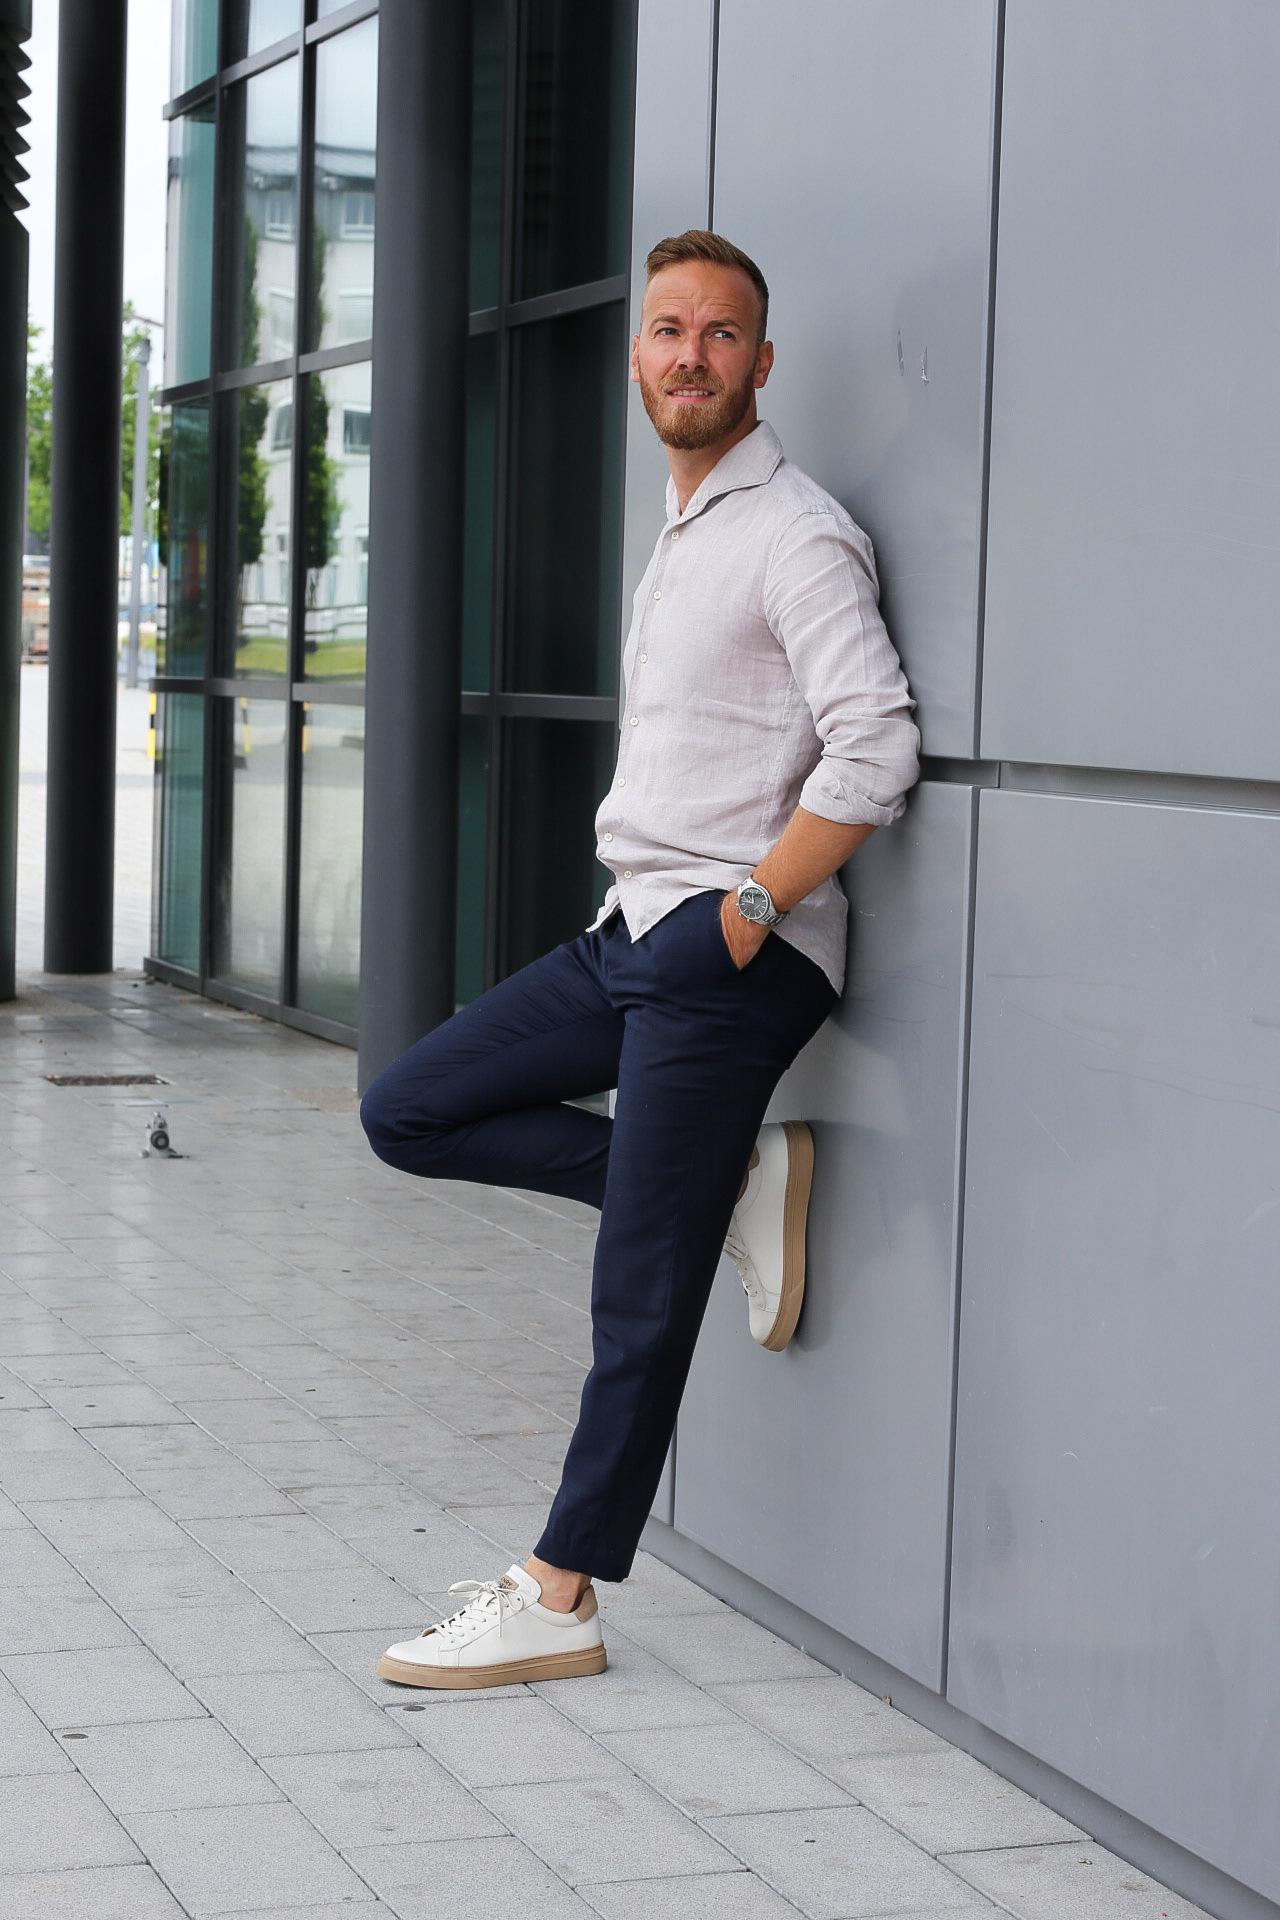 Smart Casual Look mit Sneakers von Henry Stevens menswear mensfashion menwithclass gentleman style gentlemen outfit ootd herren herrenmode Hochzeit männer anzug